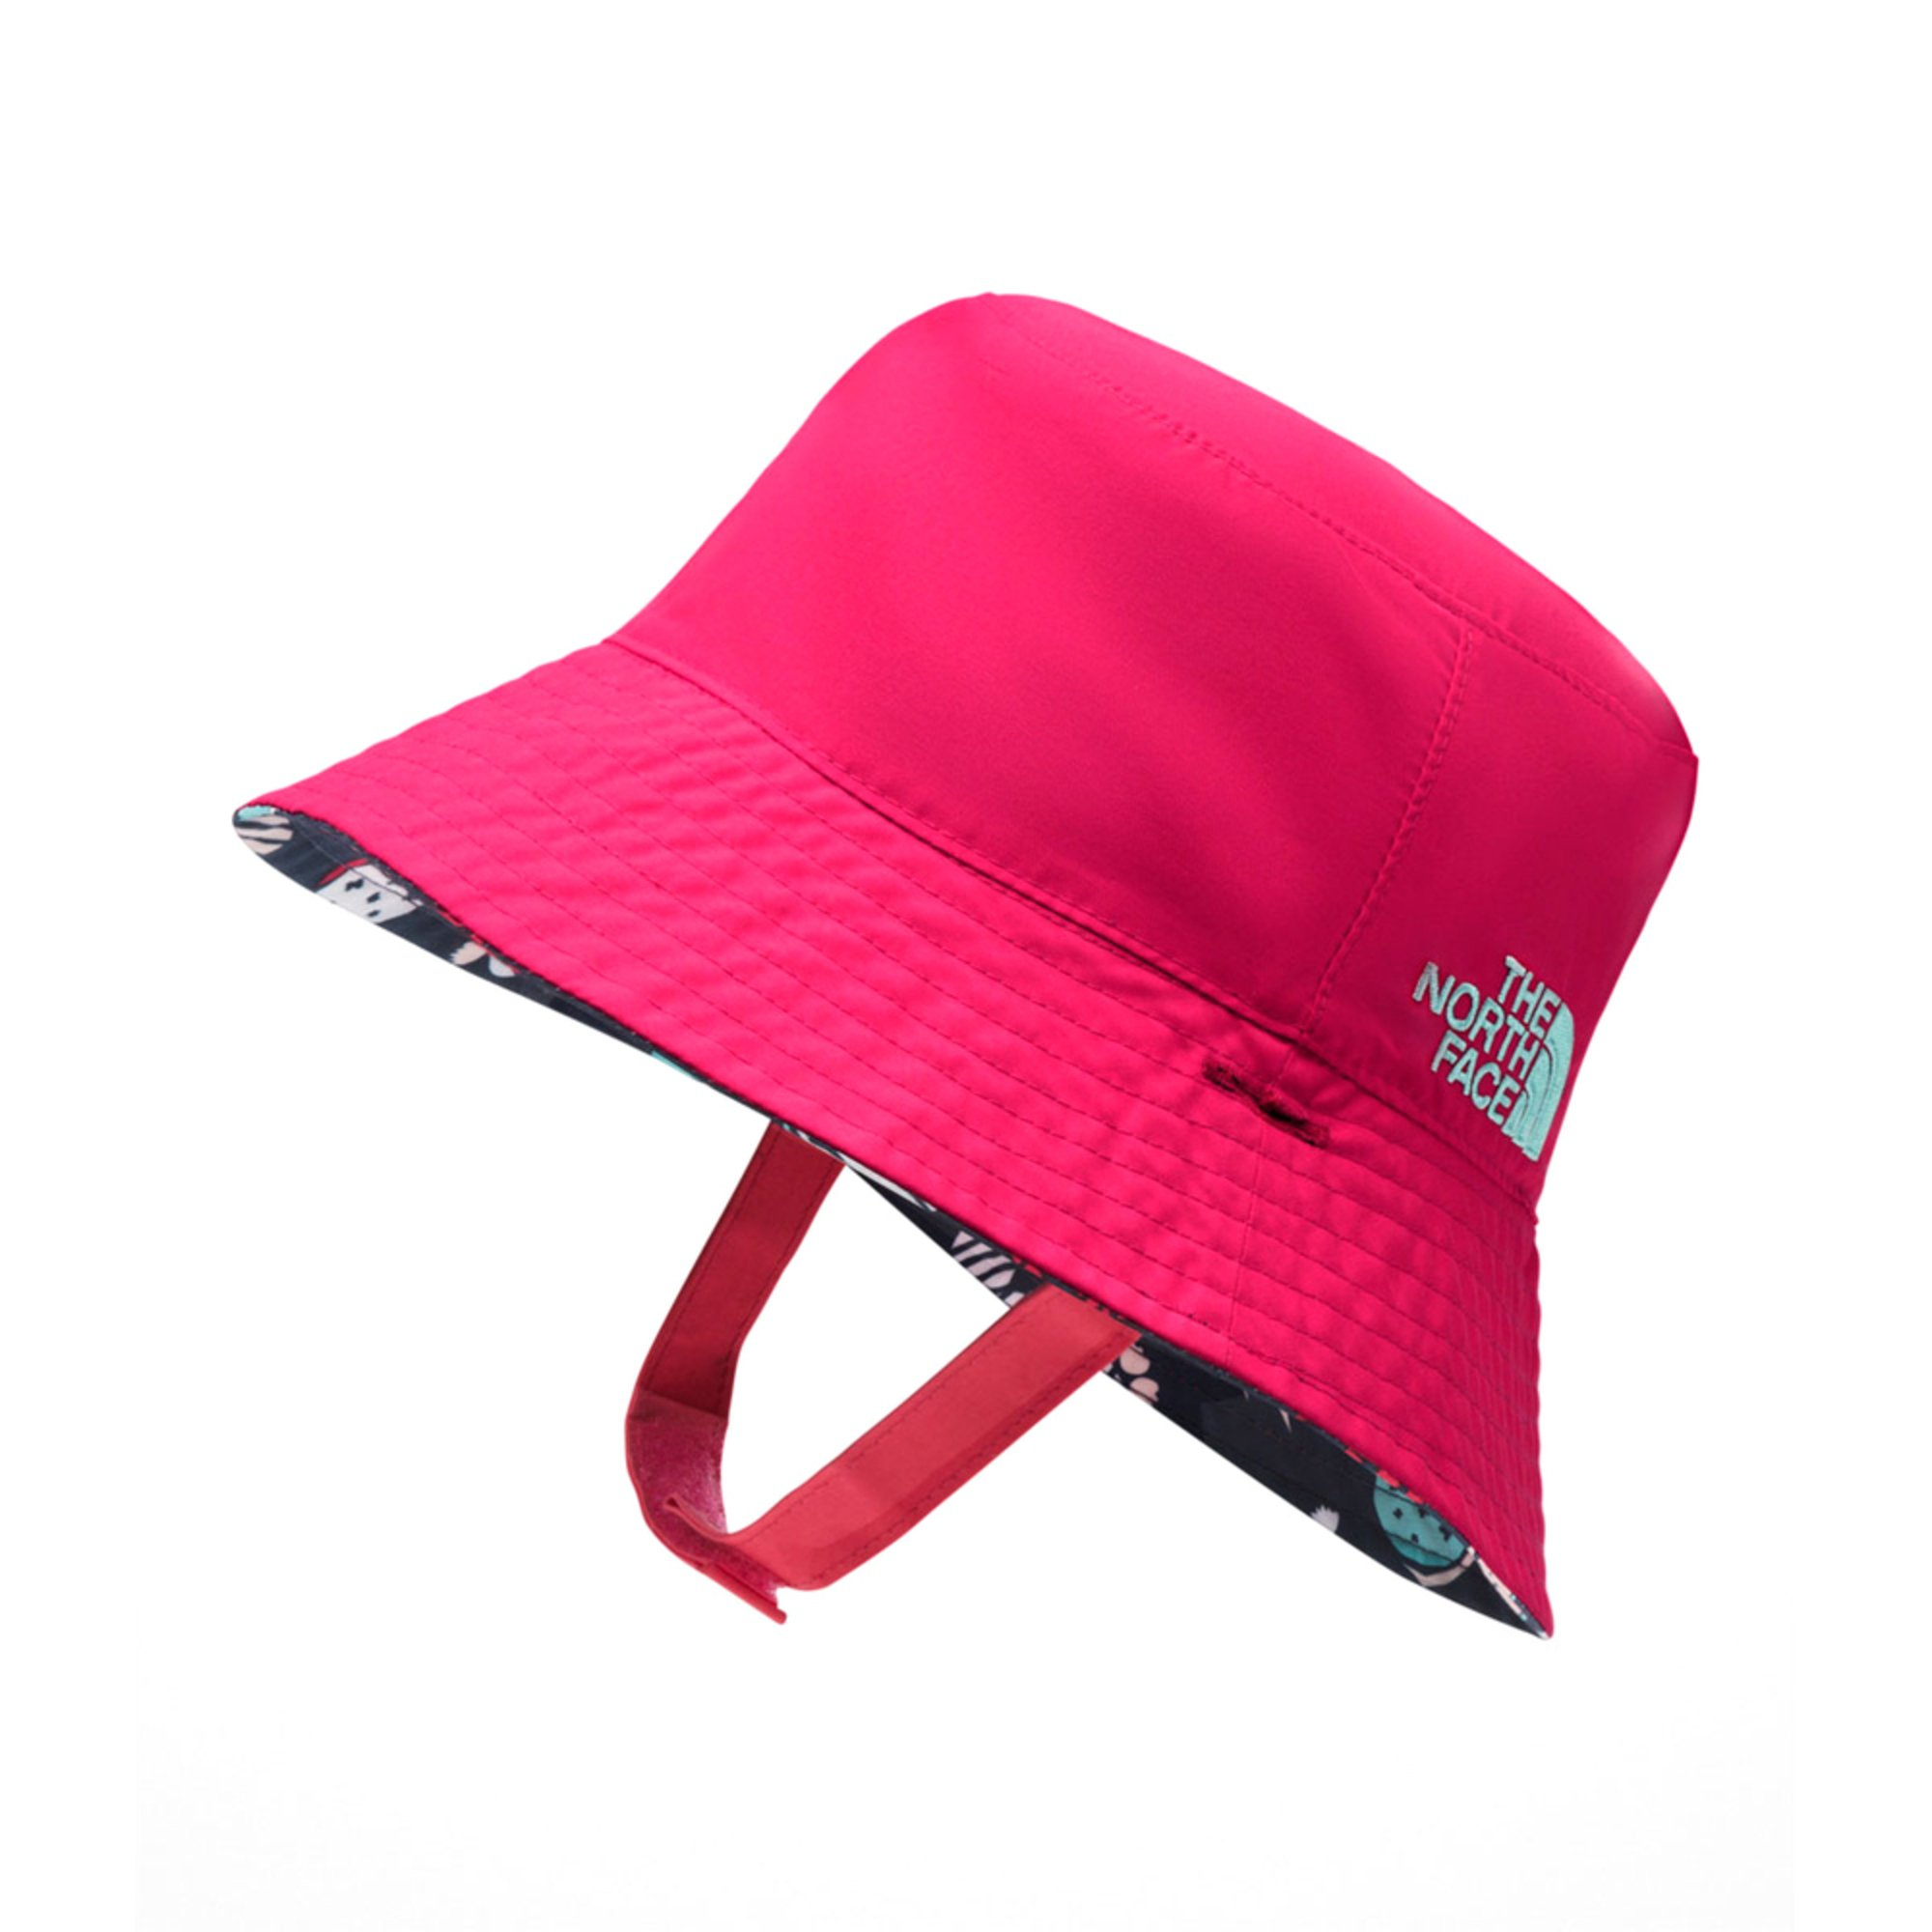 9bcb73ca3 The North Face Baby Girls' Sun Bucket Hat